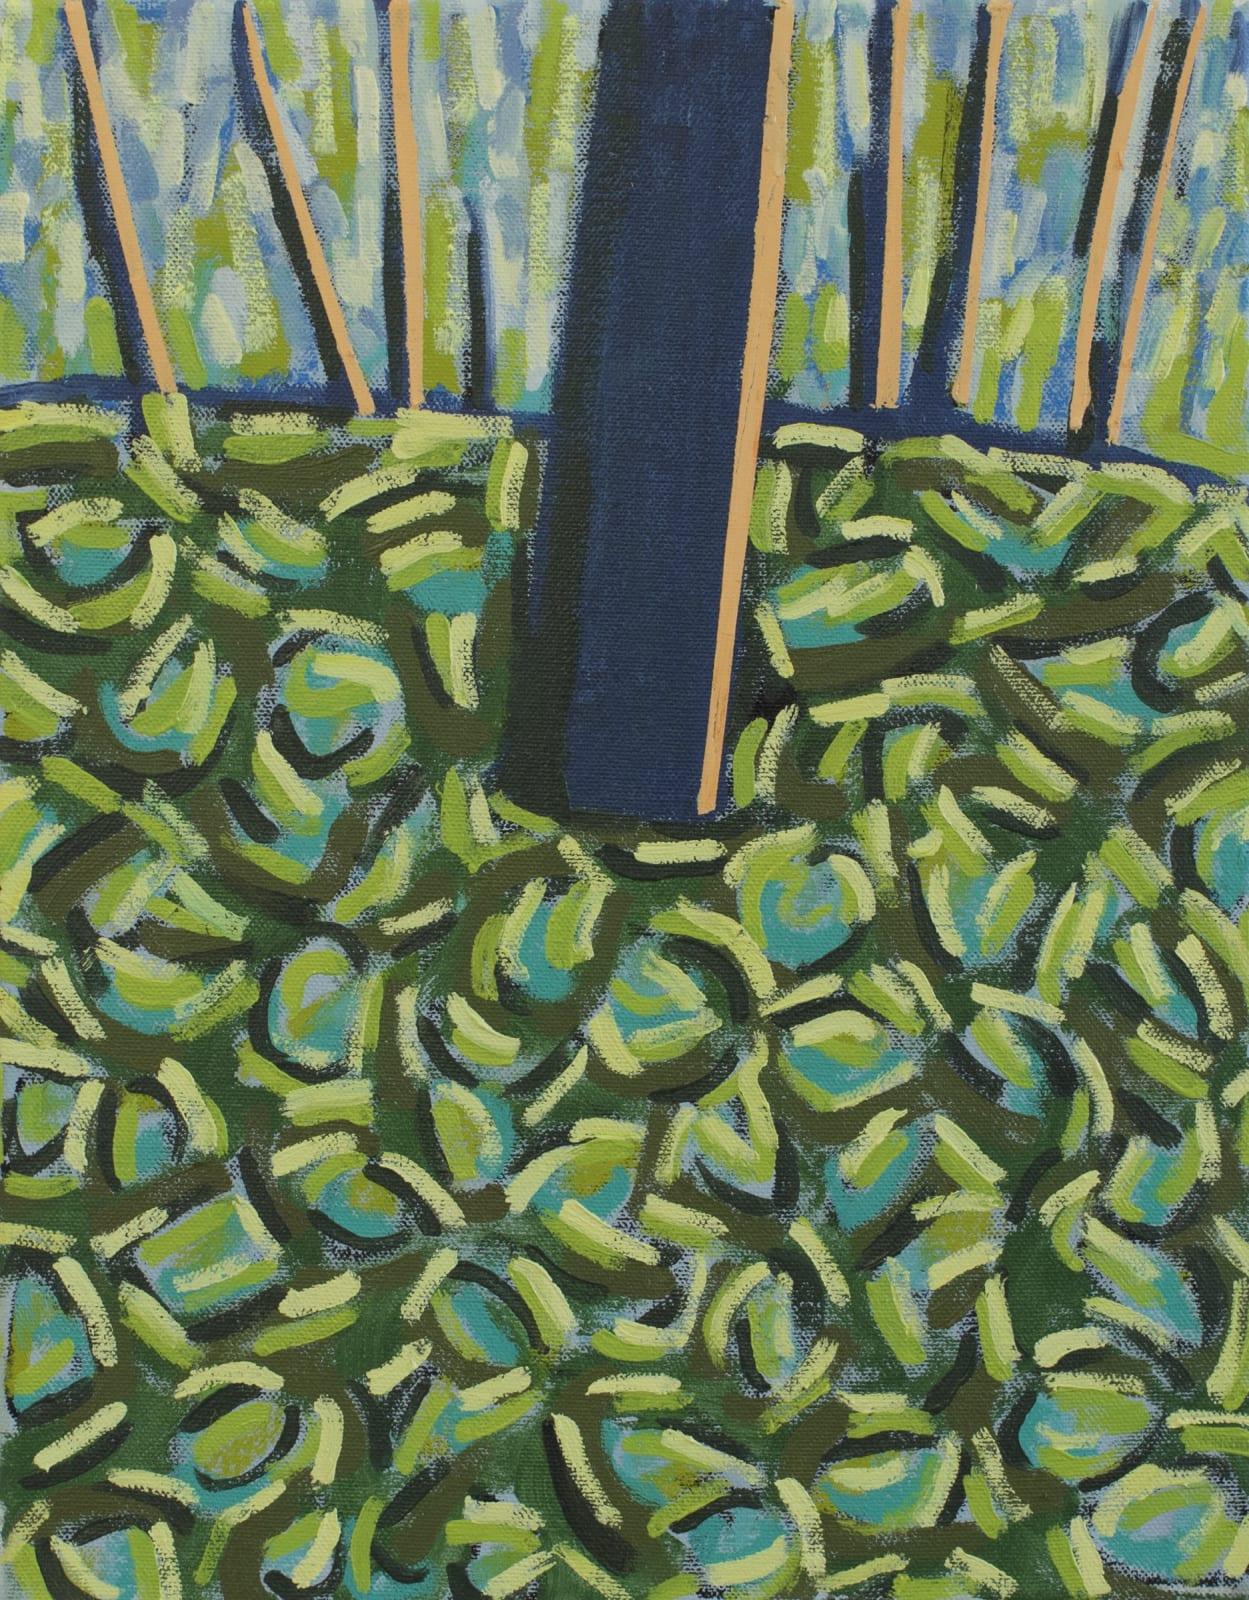 Richard Keen: Shore Path